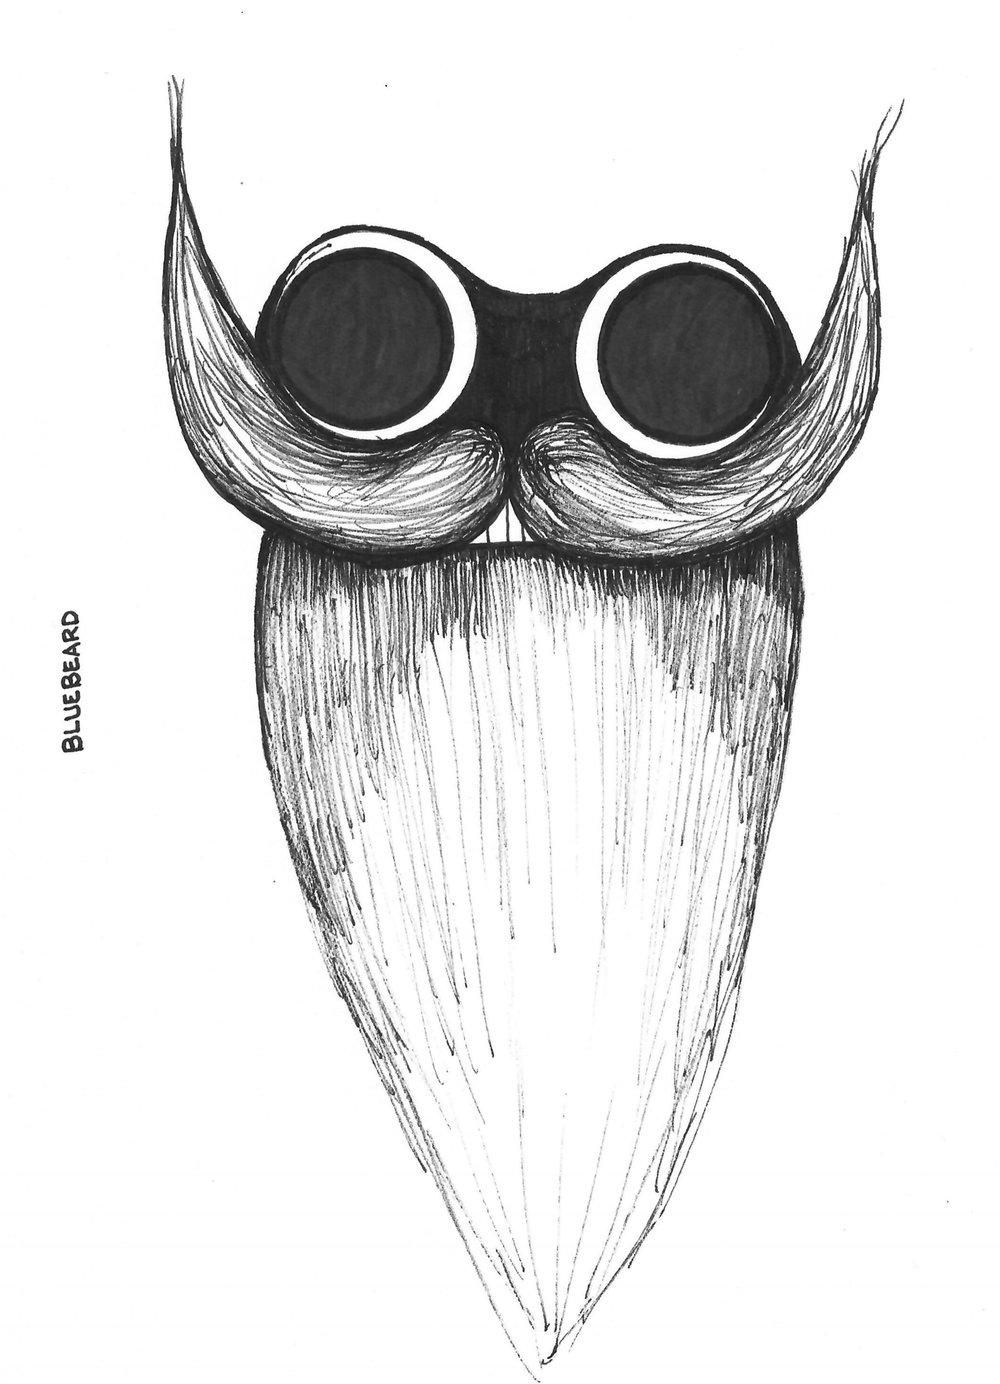 Bluebeard mask design